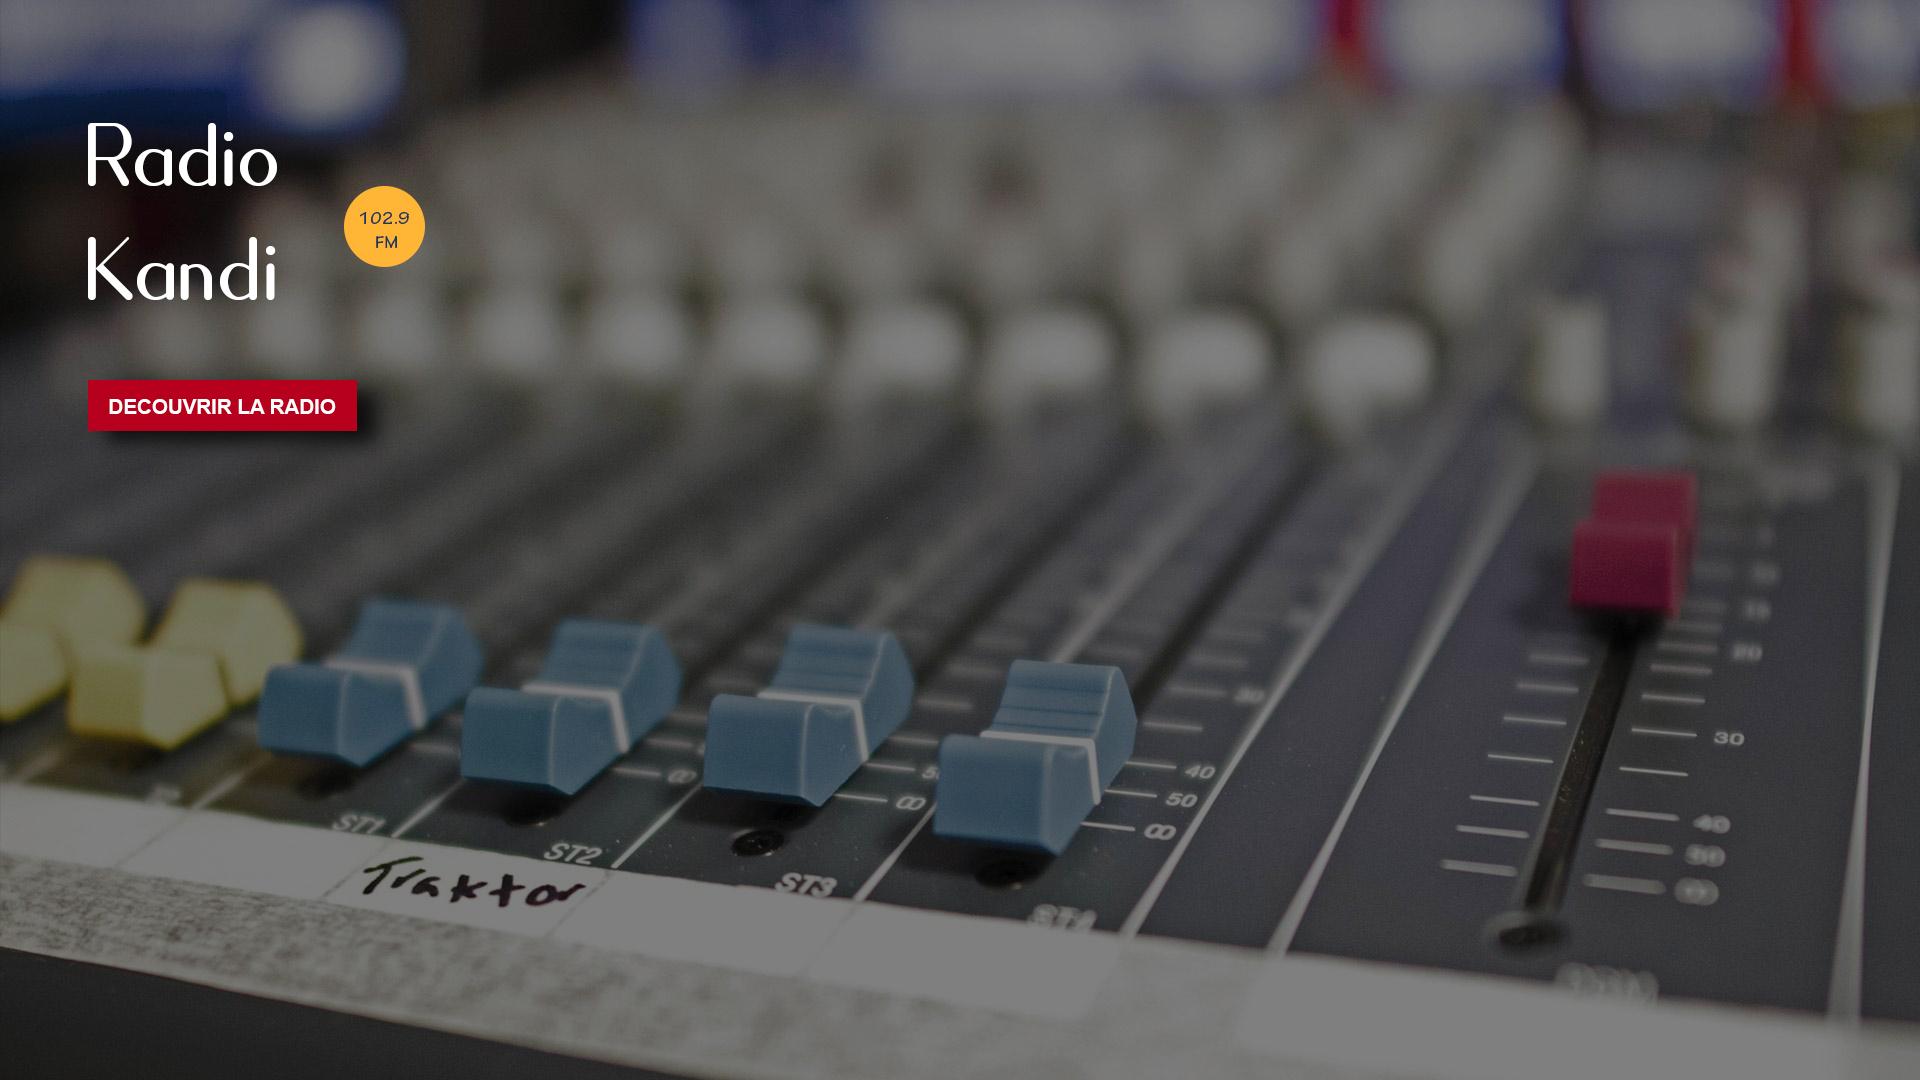 Bienvenue sur le portail de Radio Kandi